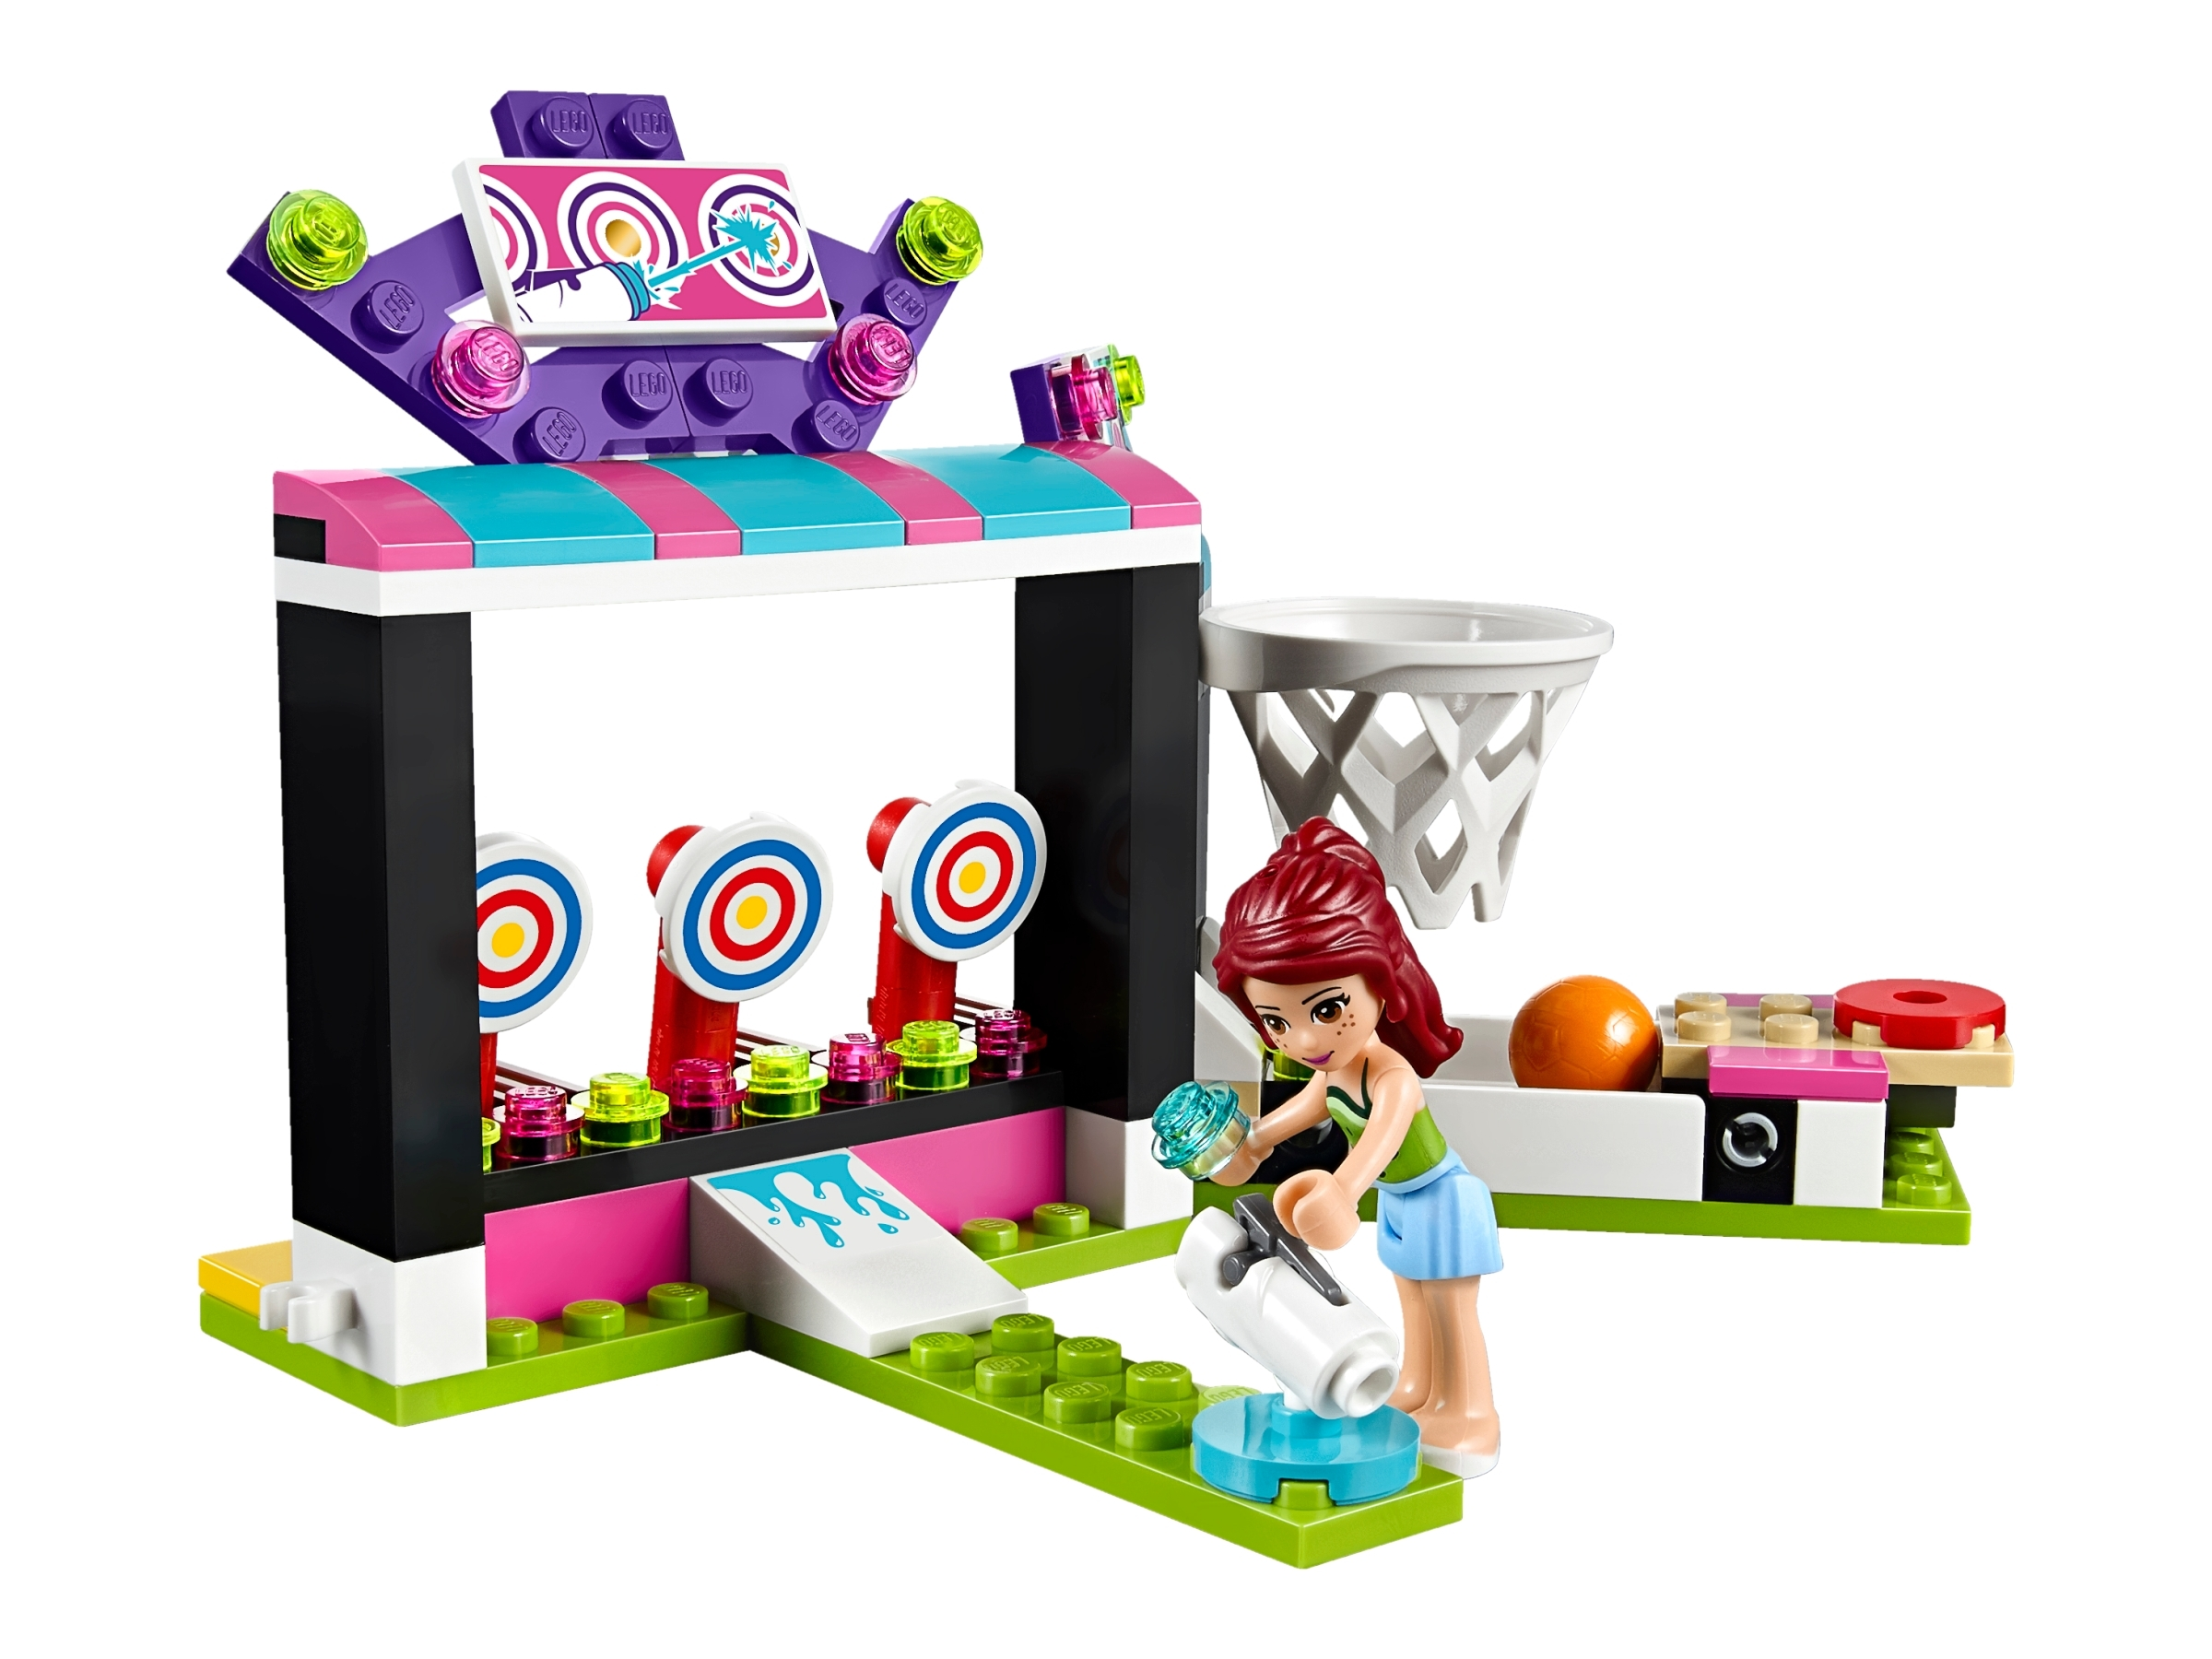 Lego Friends Amusement Park Arcade 41127 Damaged Box  Sticker Removal /& Creases